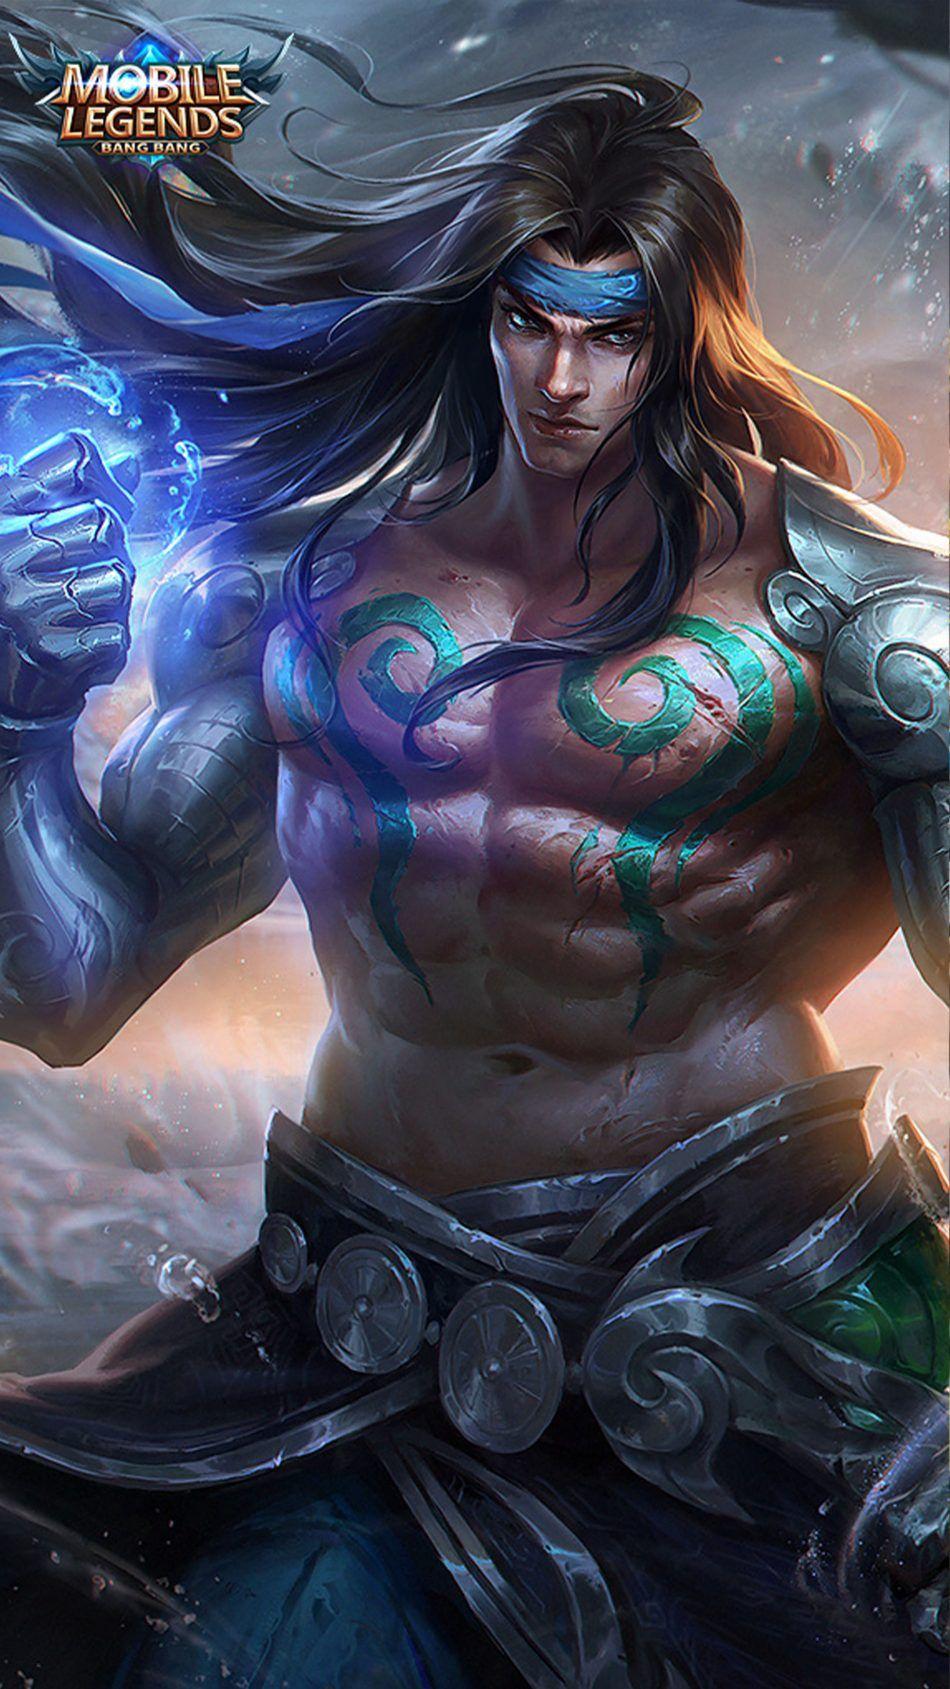 Badang Mobile Legends 4k Ultra Hd Mobile Wallpaper Mobile Legend Wallpaper Hero Fighter Tribal Warrior